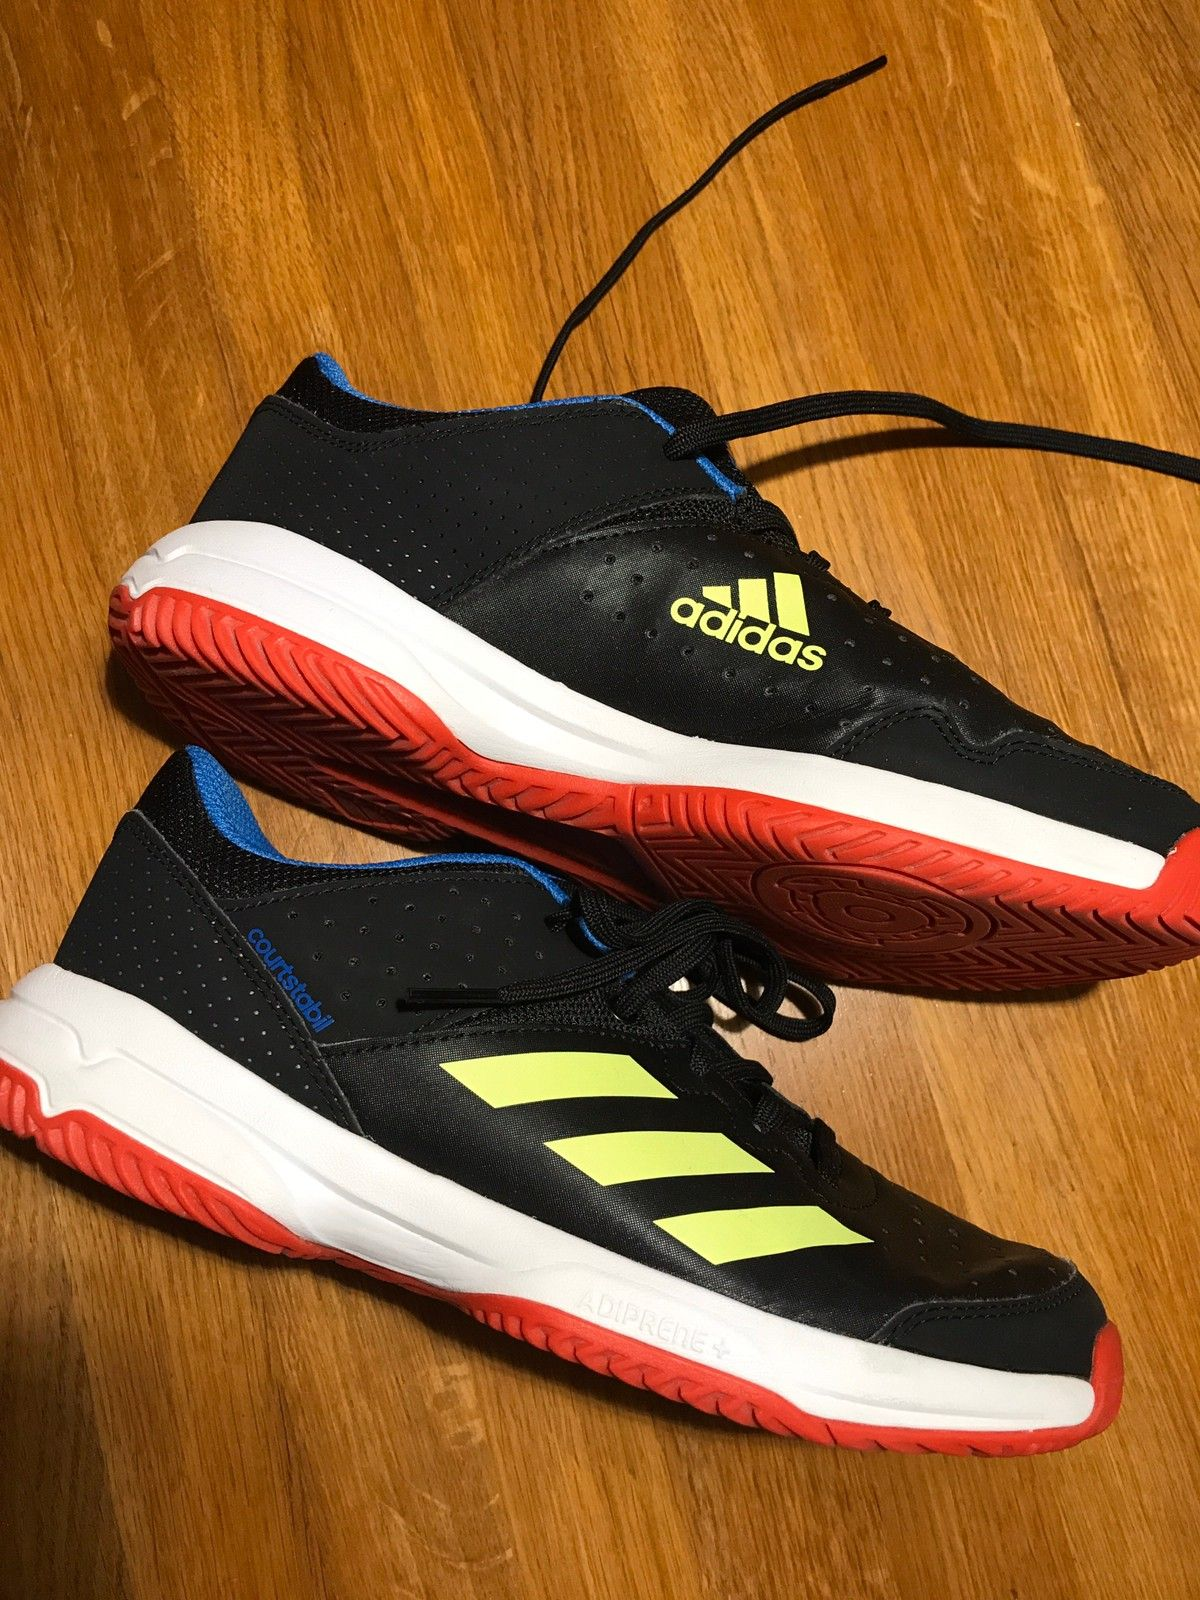 Adidas basketball sko str 40 selges rimelig | FINN.no